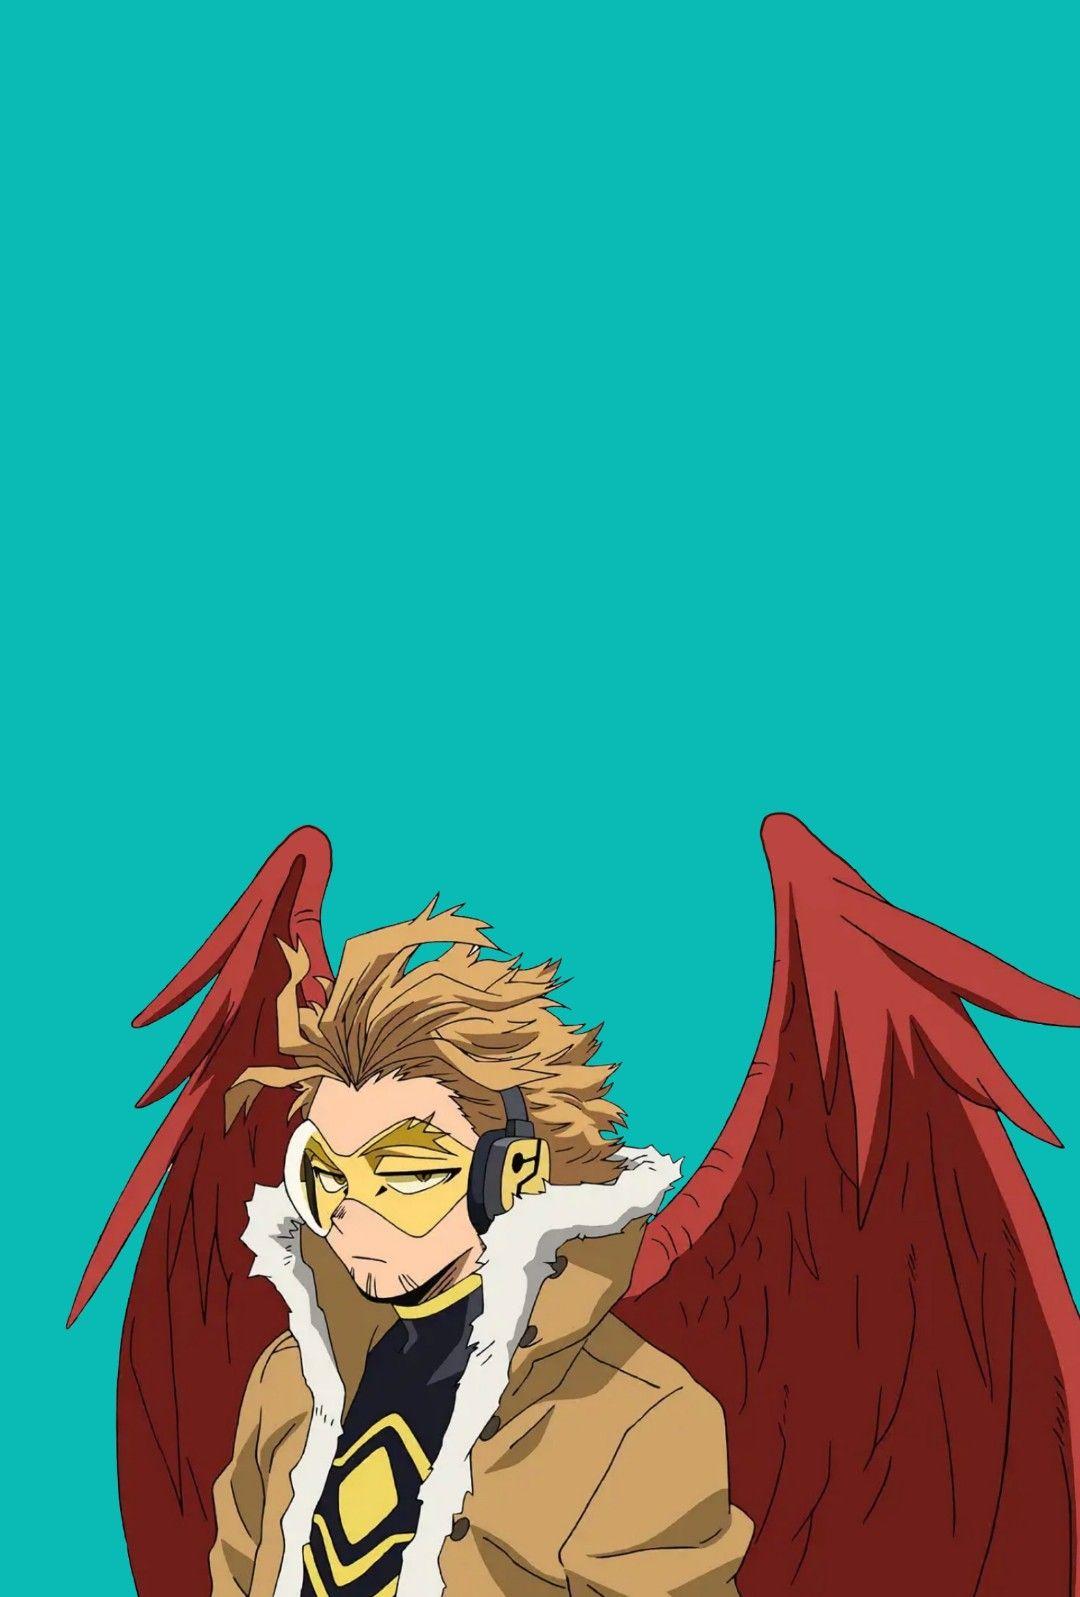 Hawks Bnha Wallpaper Hawk Pictures Anime Wallpaper Iphone Anime Wallpaper